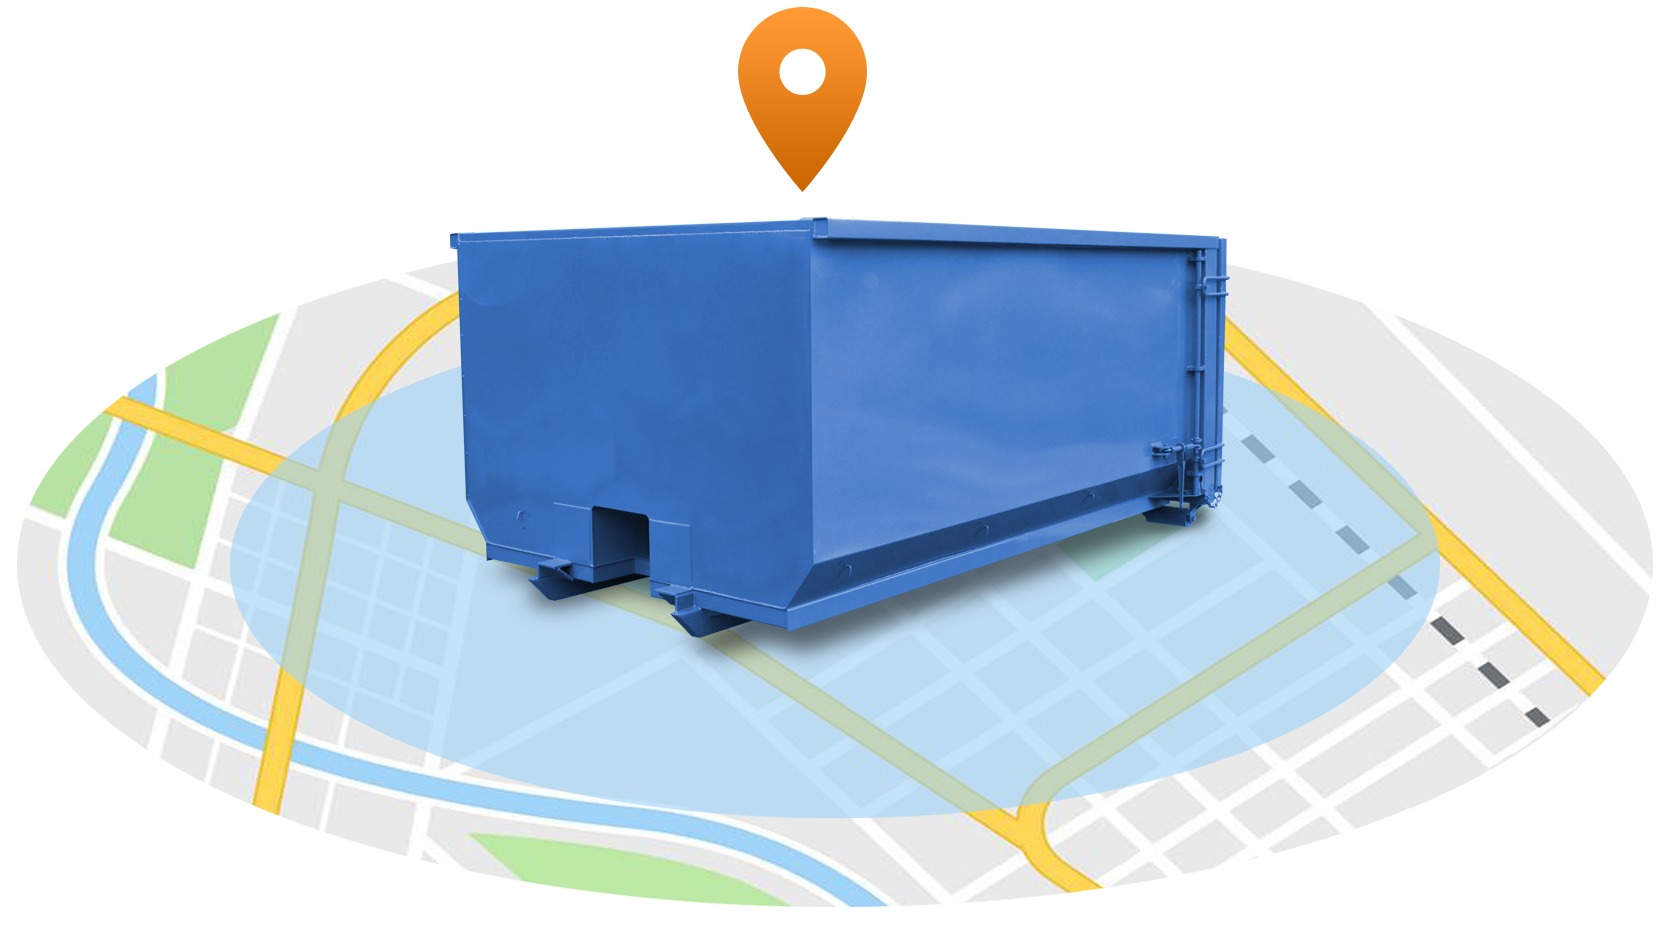 Atlantic disposal dumpster rental service area